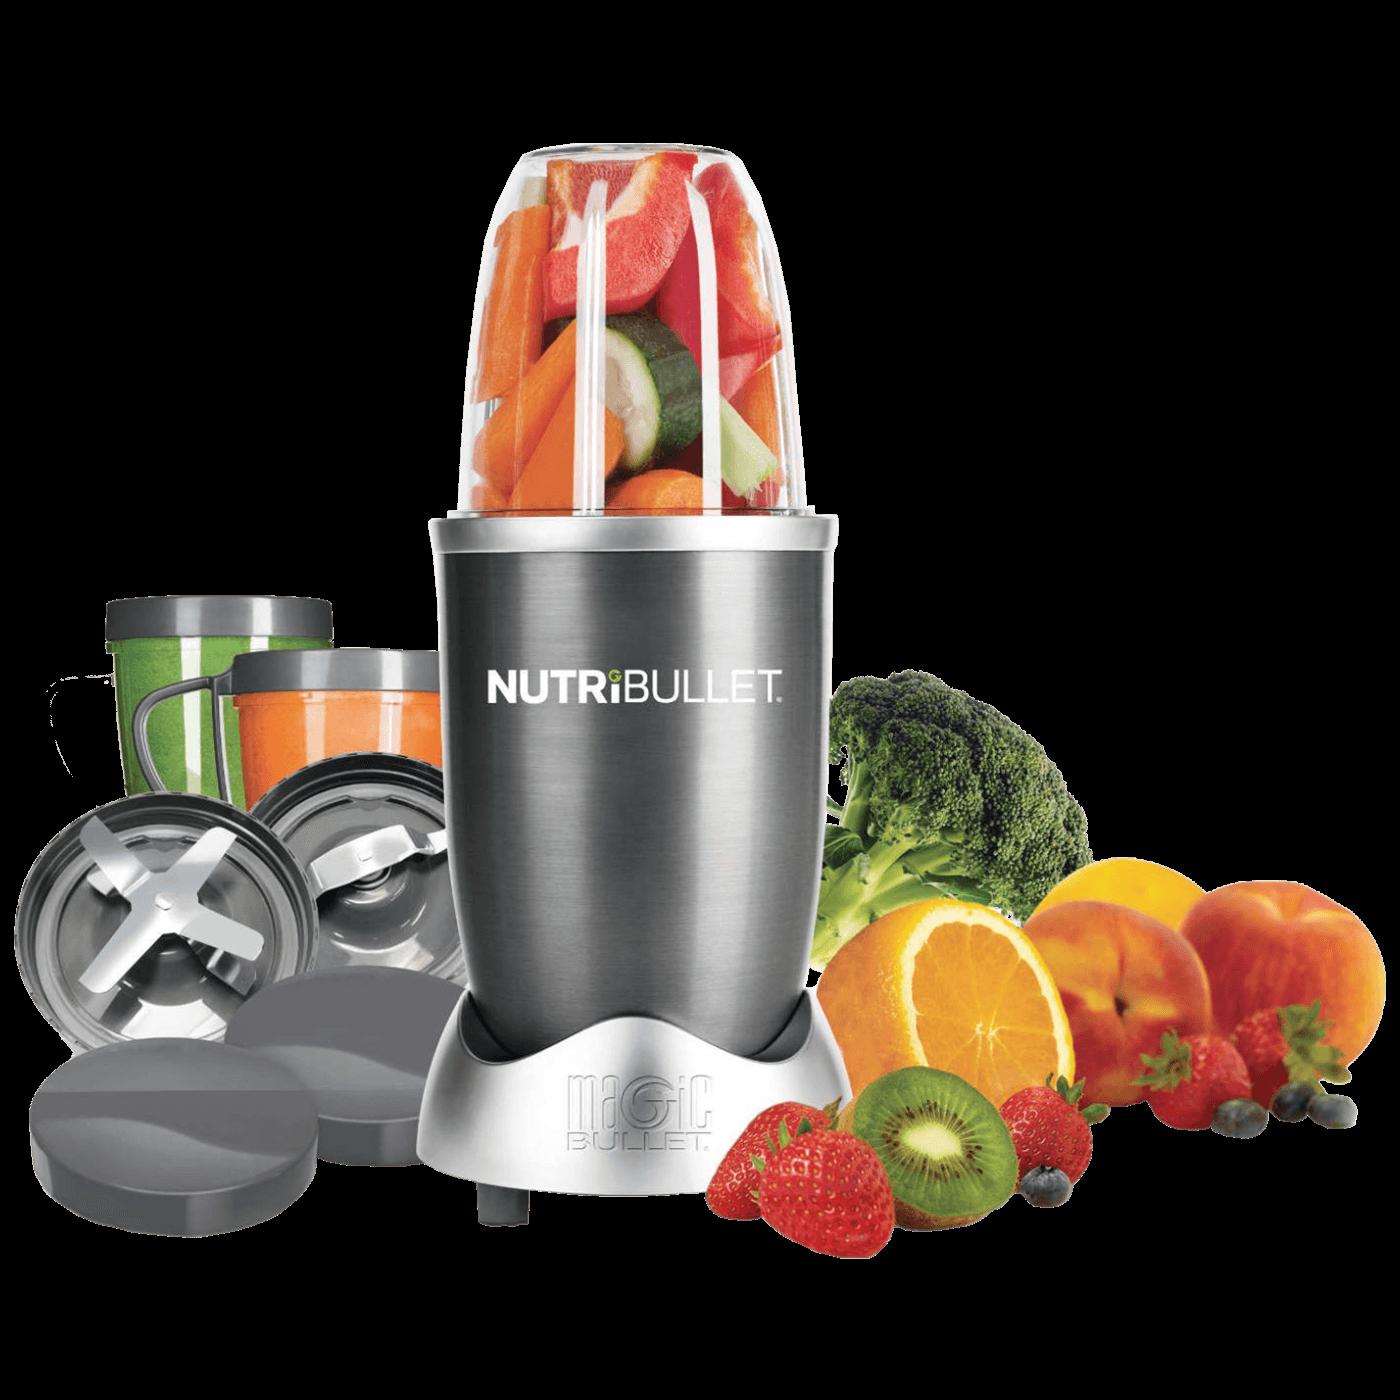 Nutribullet ekstraktor hranjivih tvari, sivi